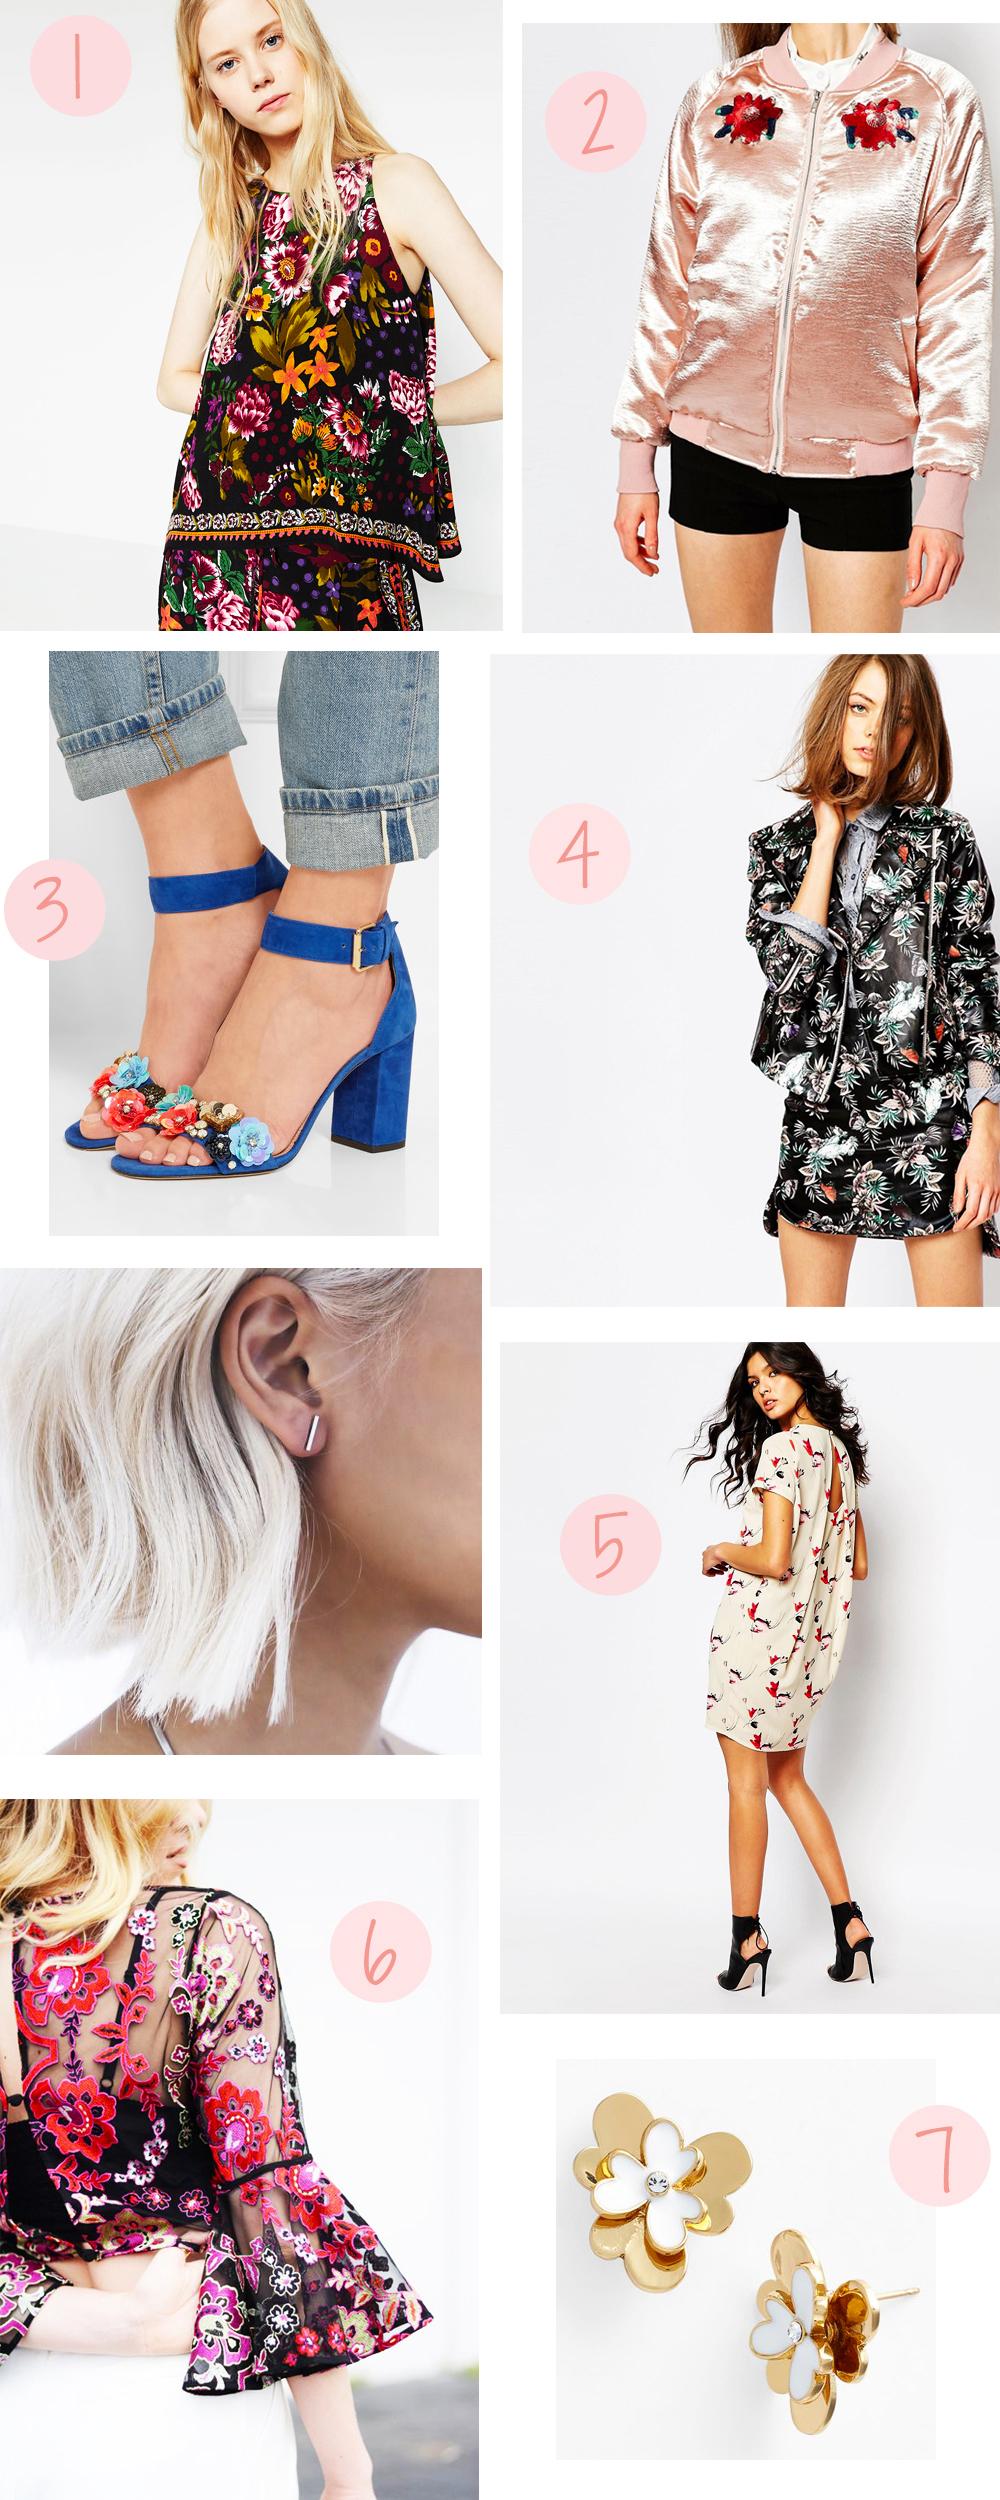 Floral-fashion-for-Spring-emmajayne-designs